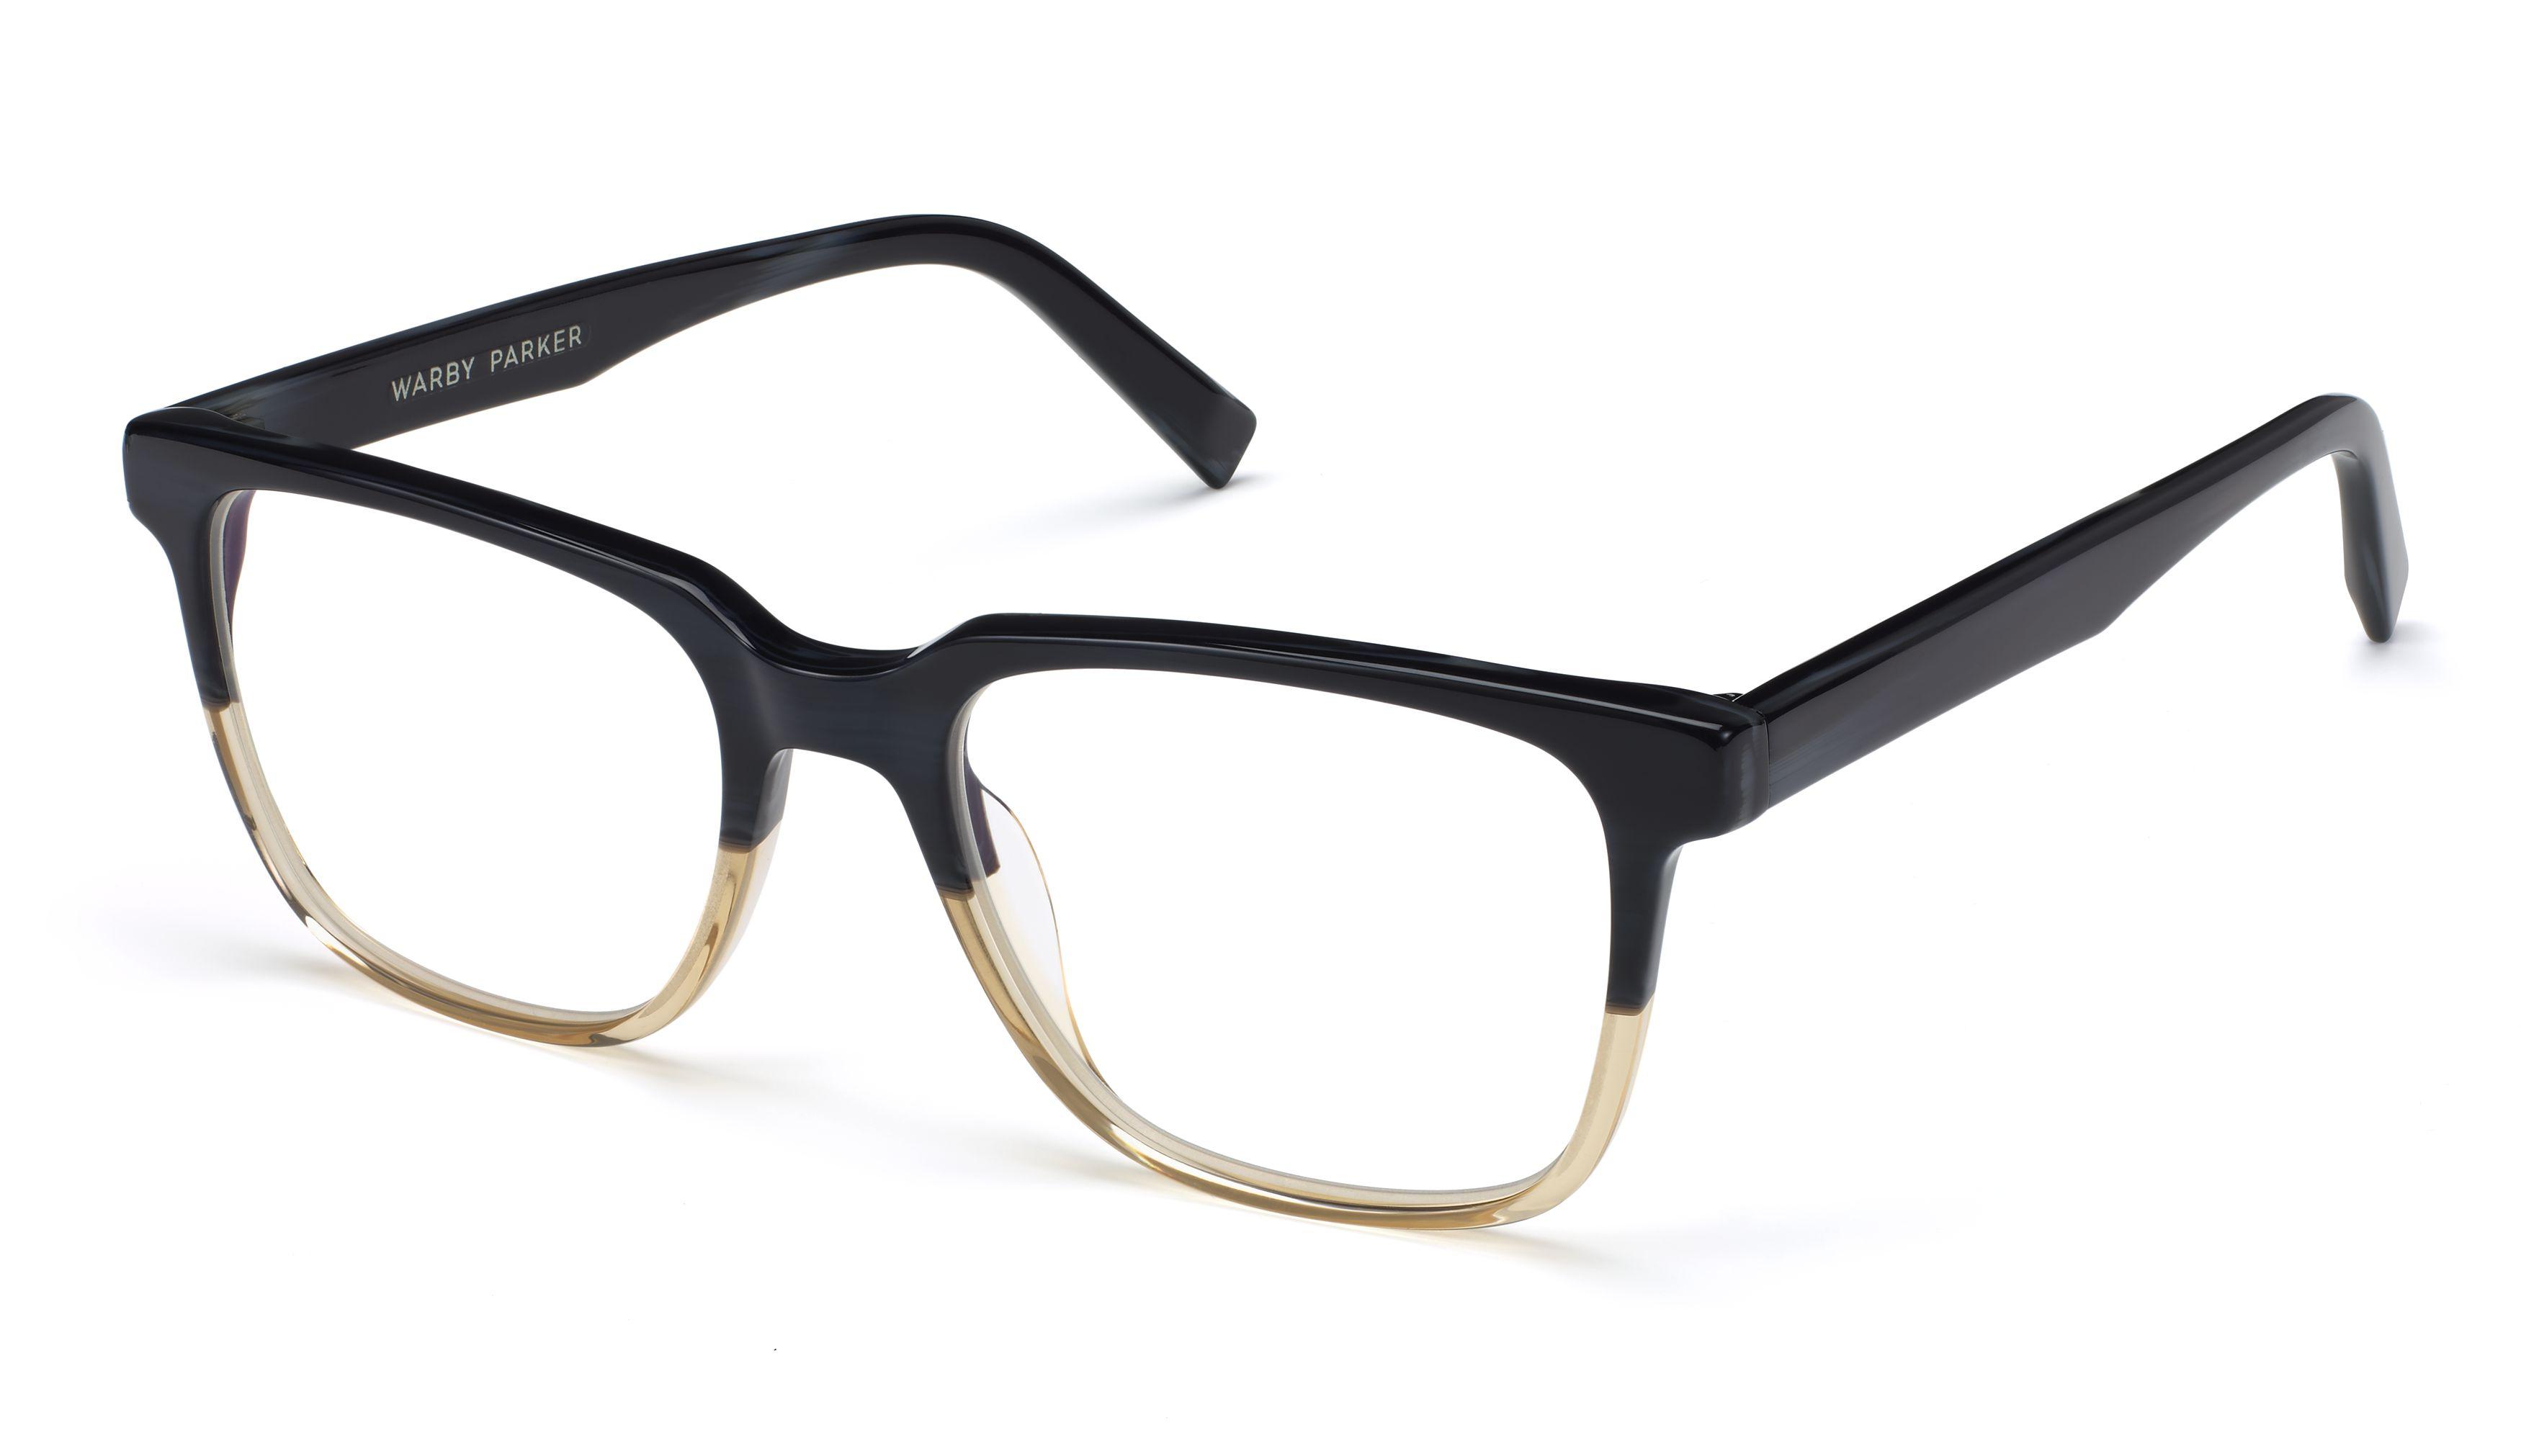 da47c2a353b9 Chamberlain Eyeglasses in Mission Clay Fade for Men